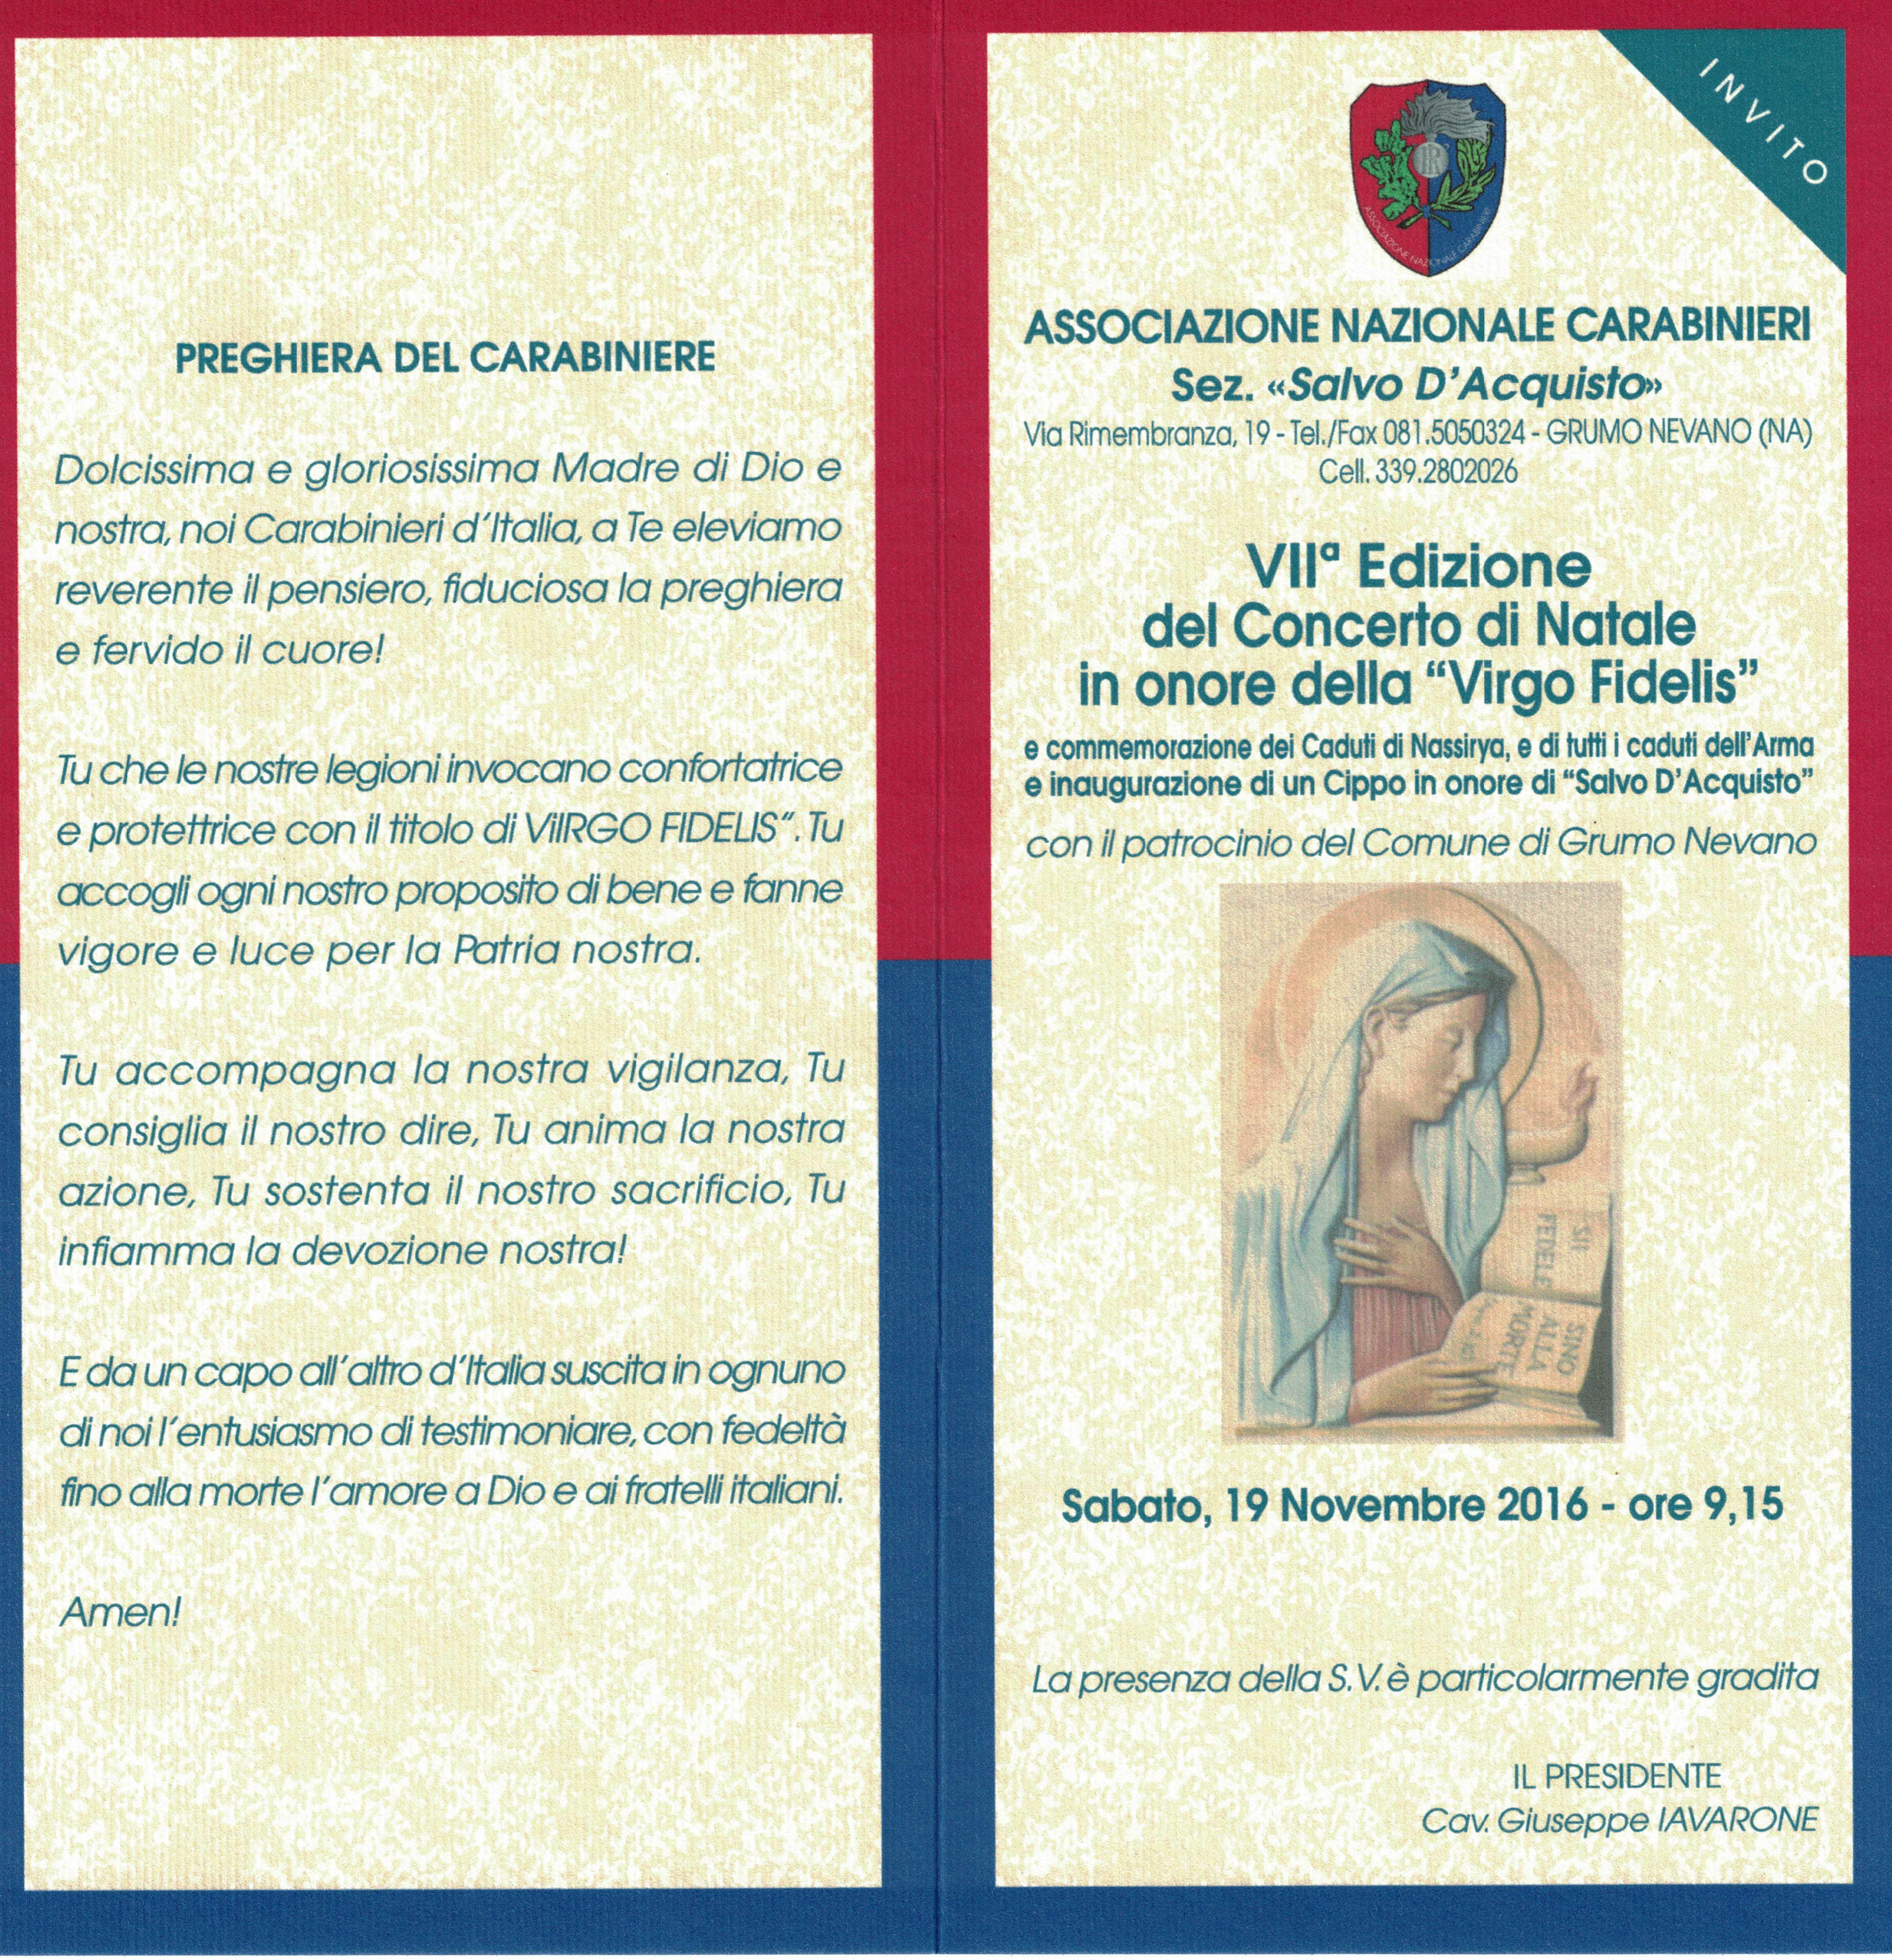 carabinieri-festa-1